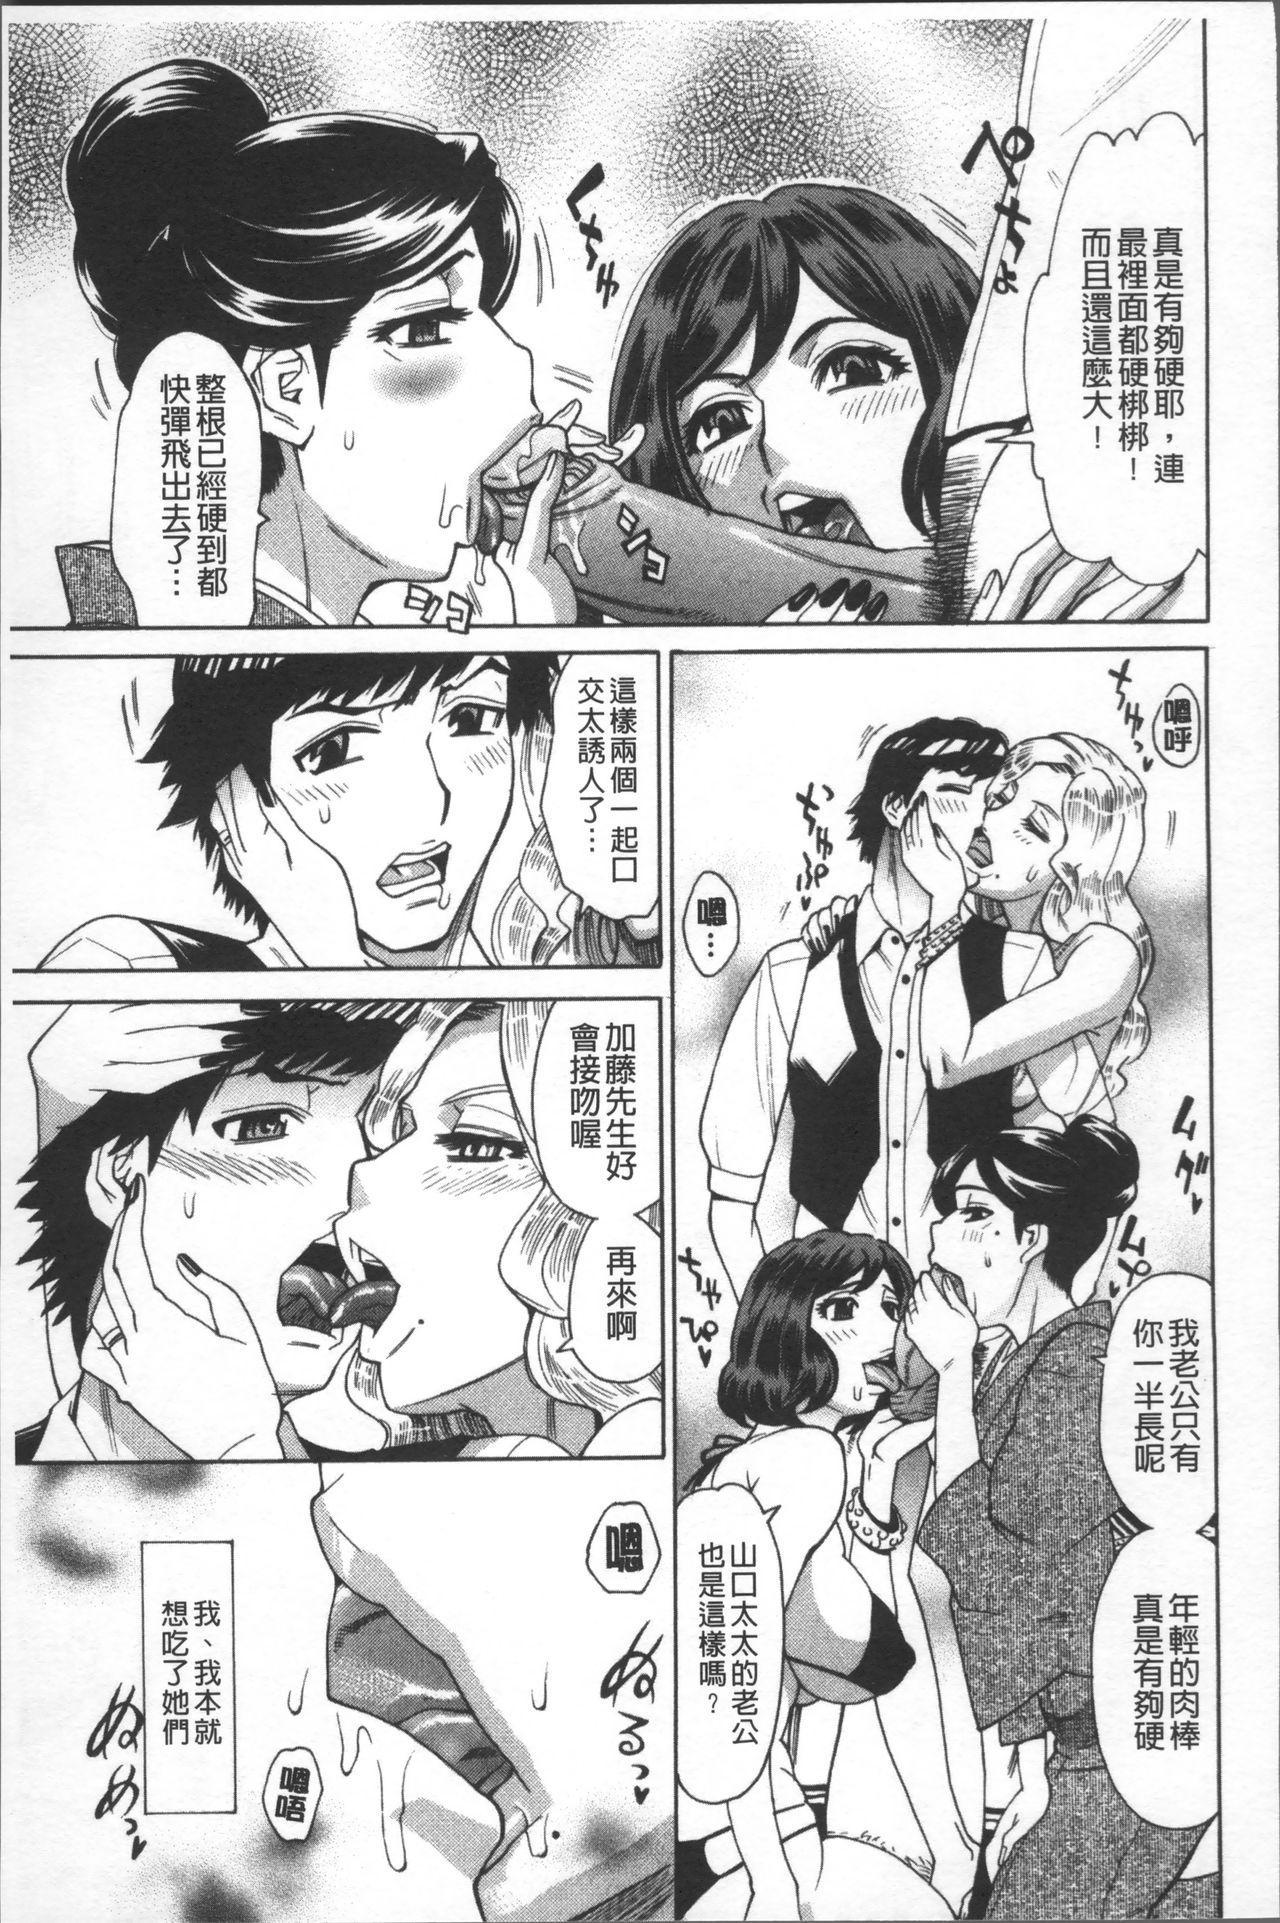 Hitozuma Kanshasai - SUPER EROTIC WIFE'S FESTIVAL 50